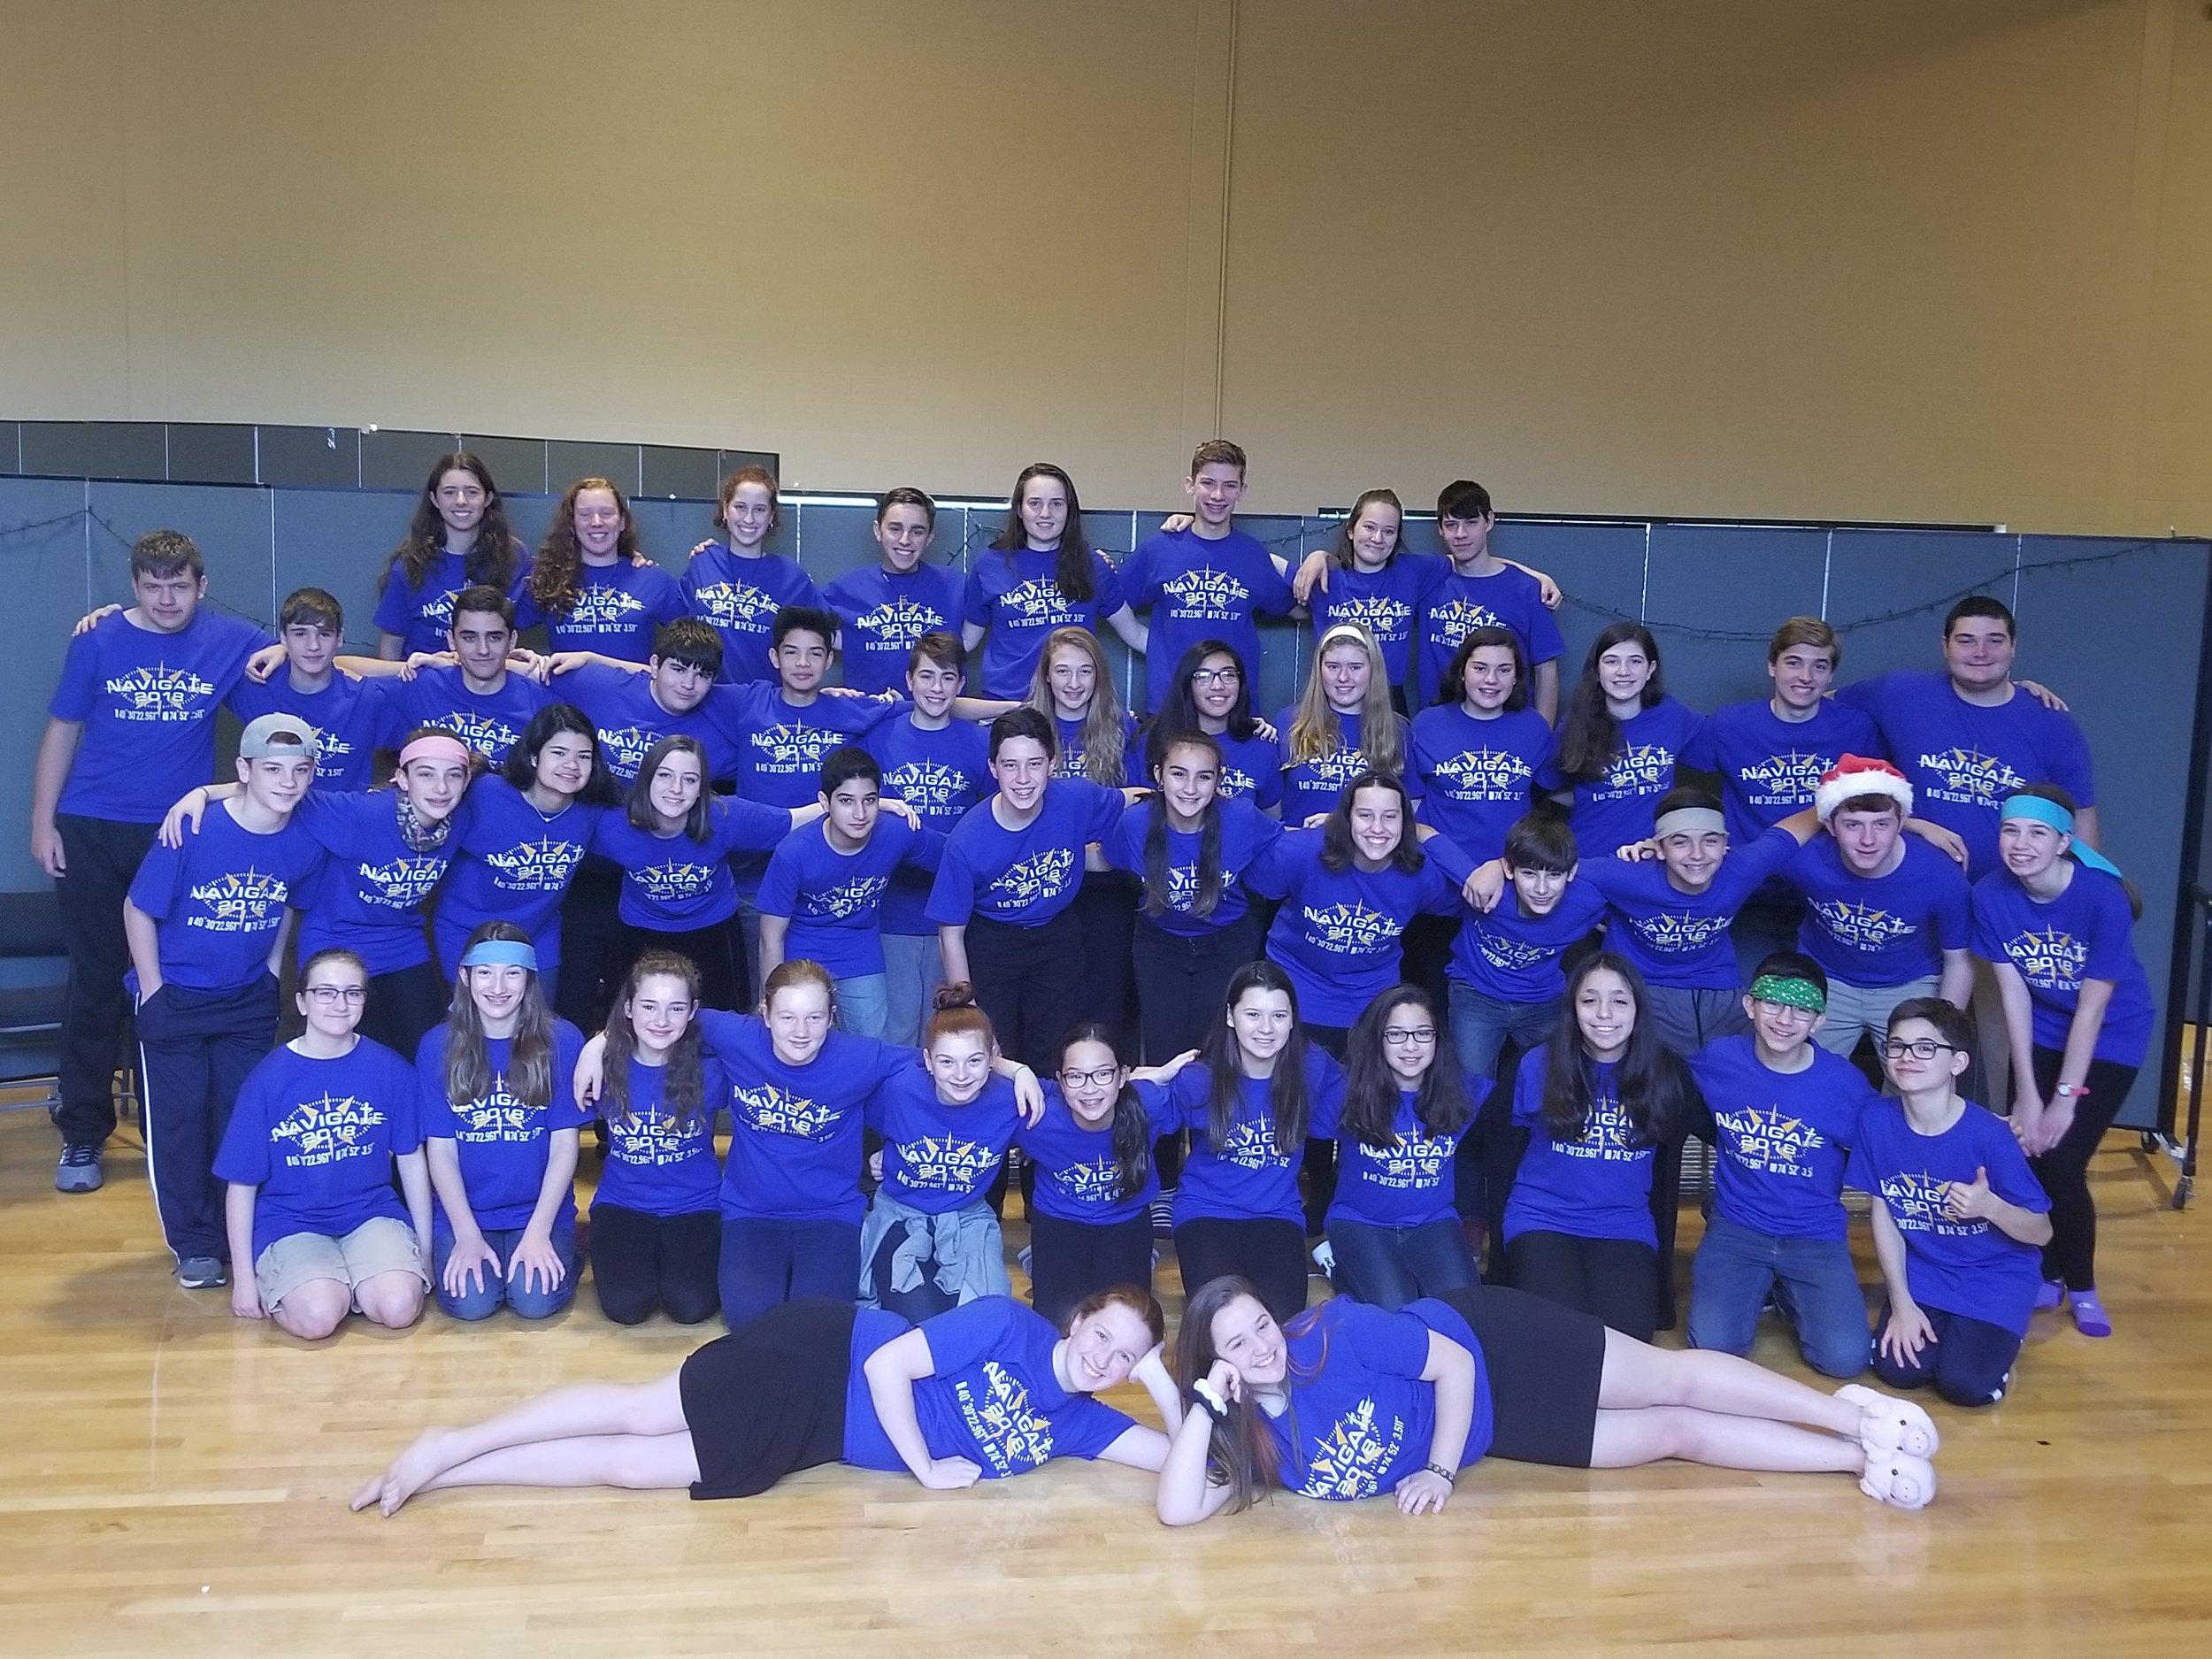 St. Magdalen's Youth Group Flemington, NJ   Winter retreat shirts.